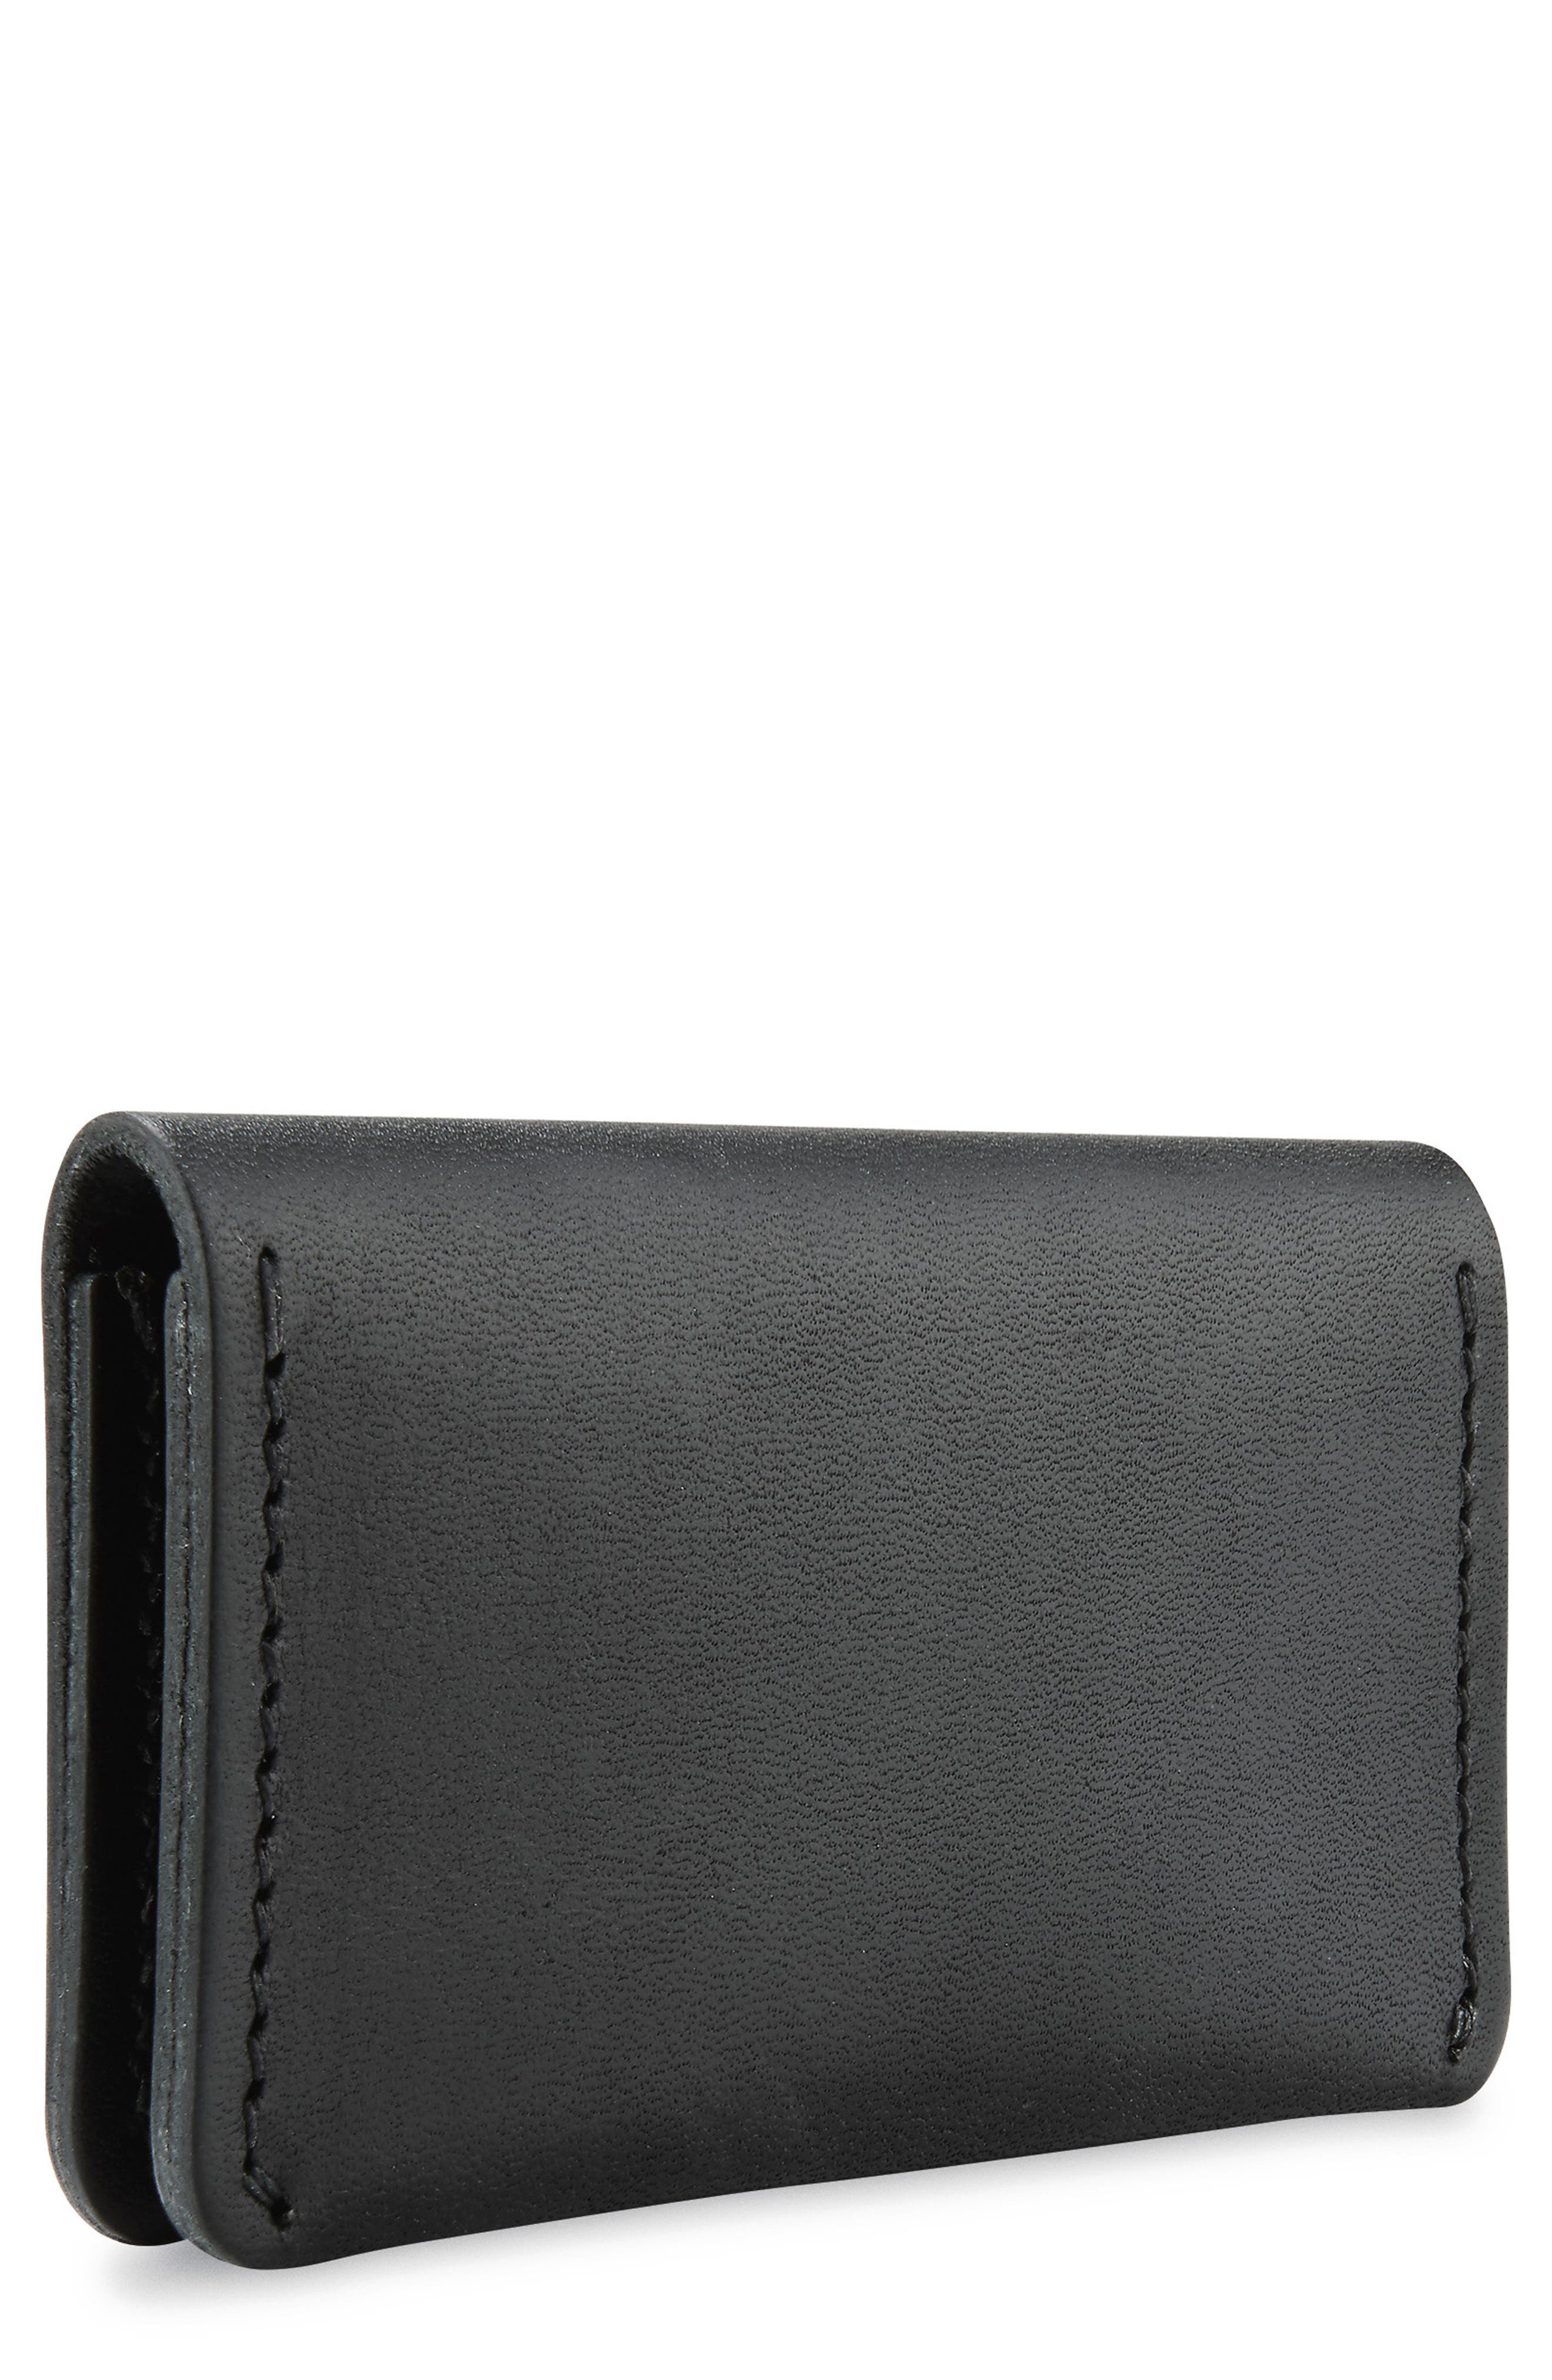 Leather Card Holder,                         Main,                         color, BLACK